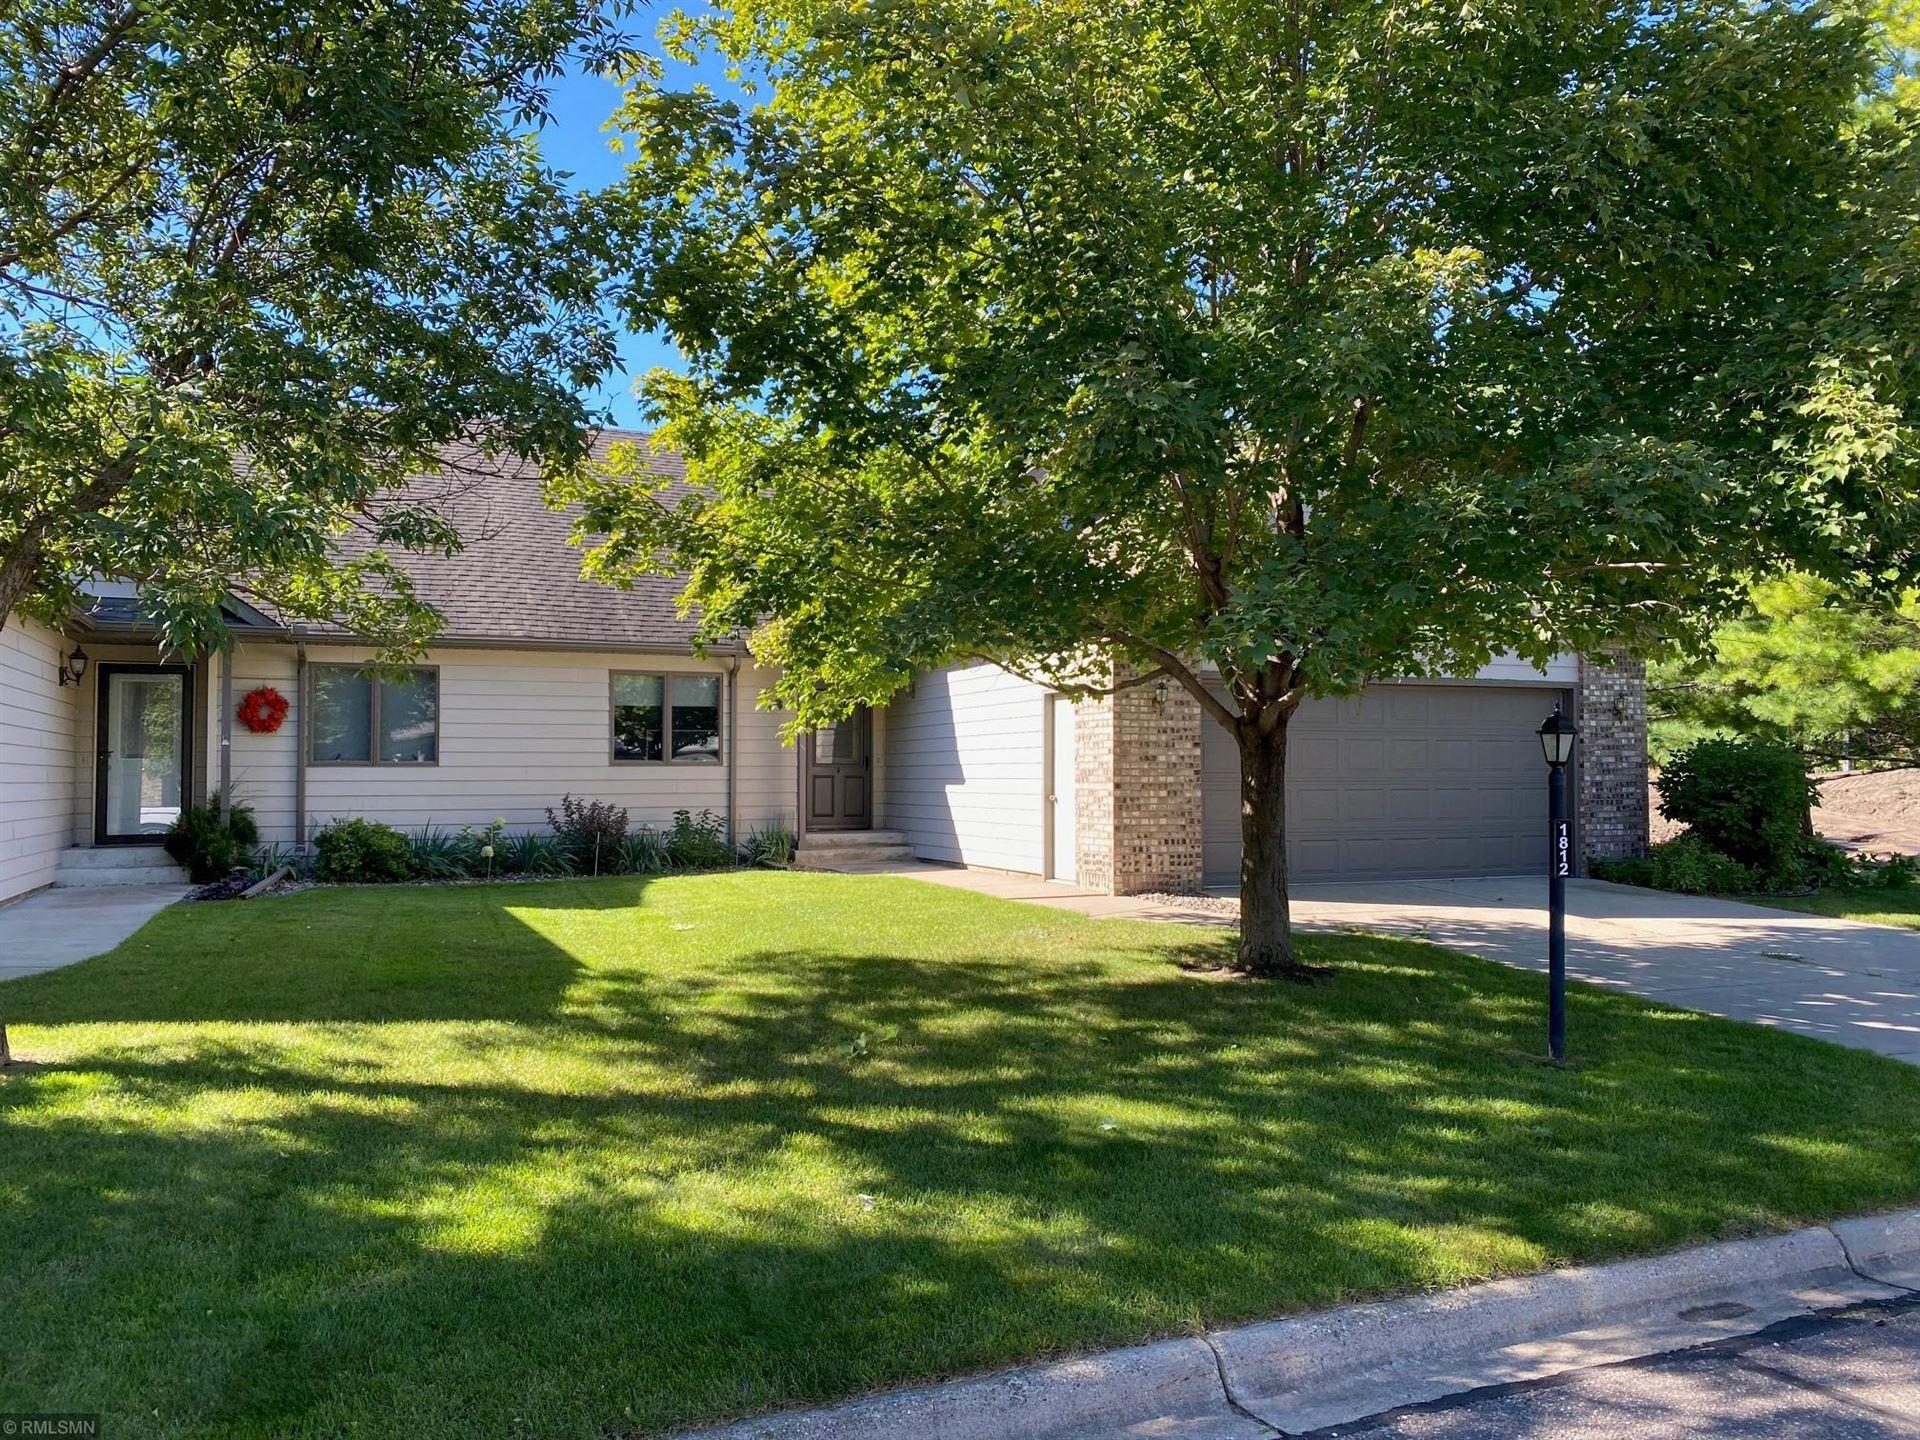 1812 Estate Lane, Northfield, MN 55057 - MLS#: 5653108